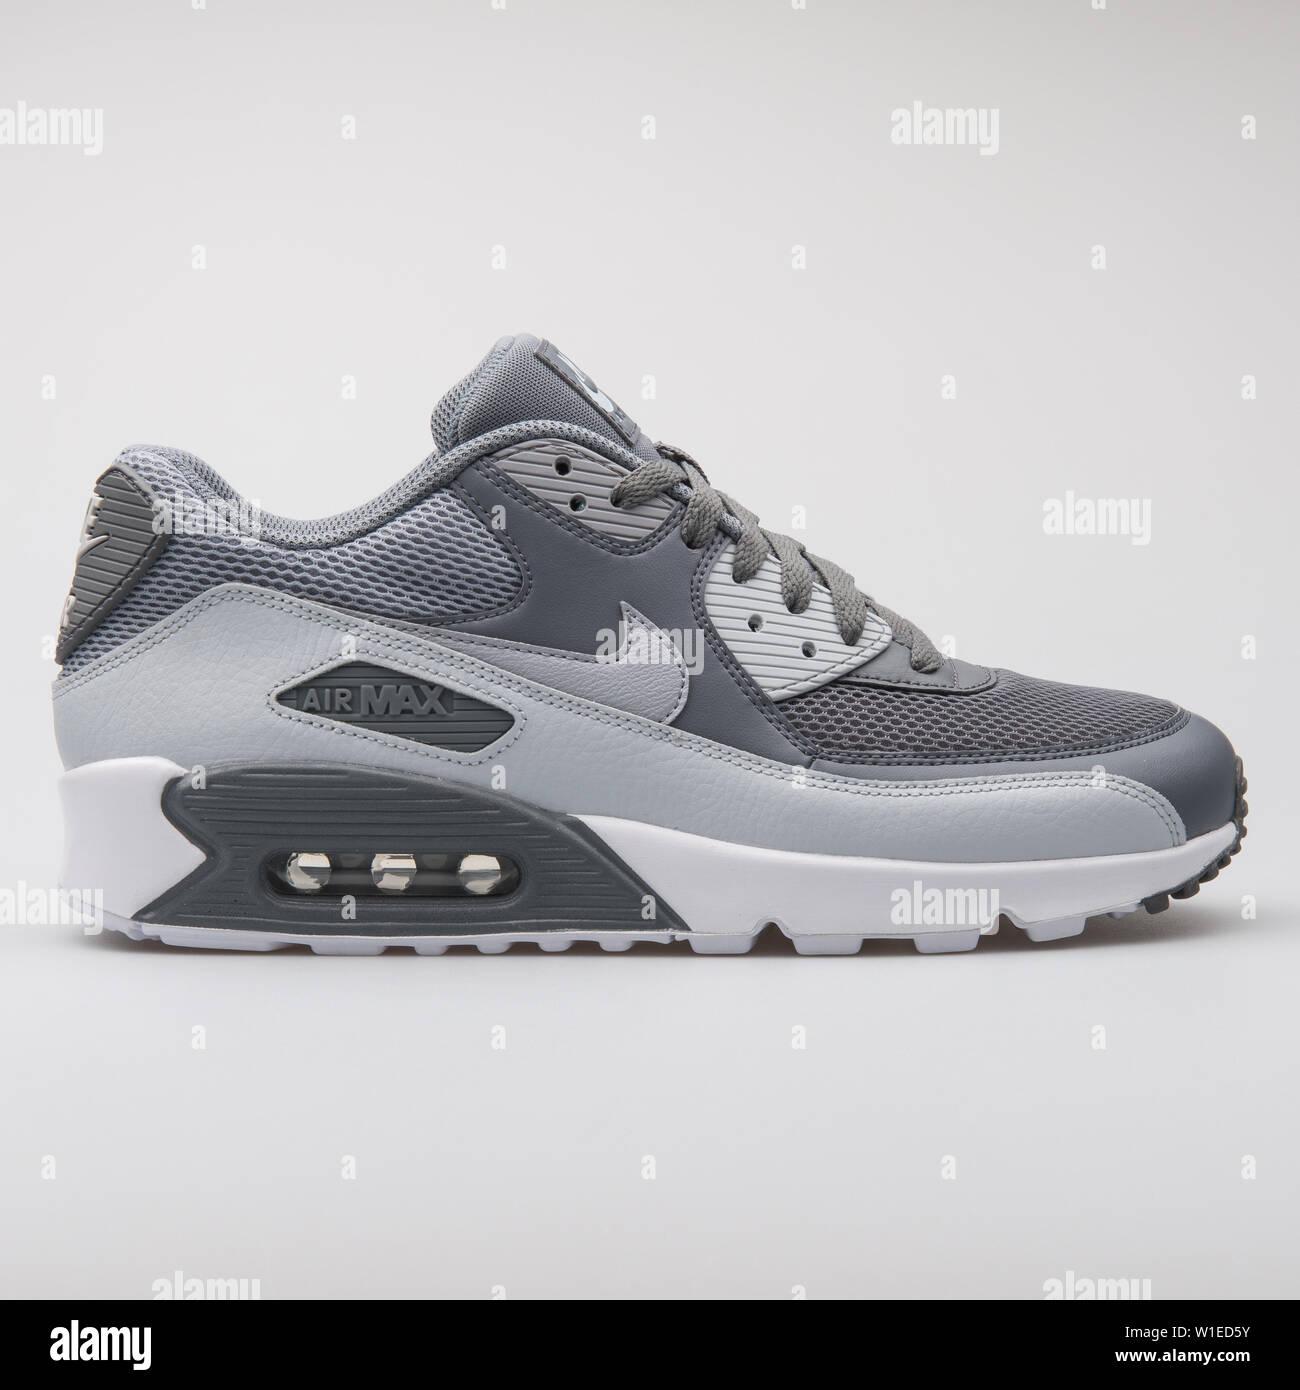 Nike Air Max 90 Ultra Essential Grey rockhavenrecovery.ca